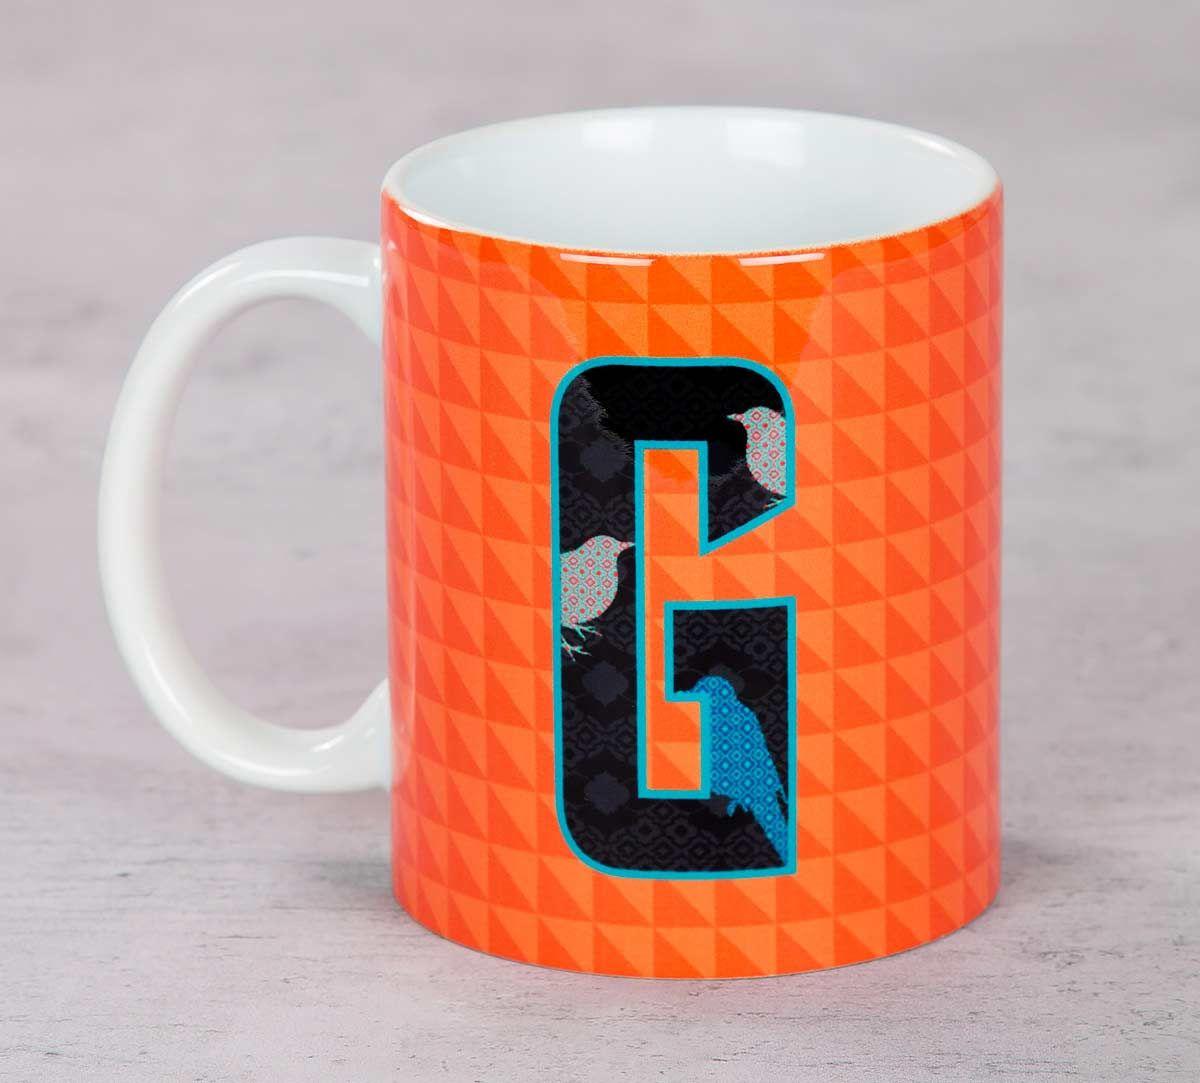 Glamourous Coffee Mug